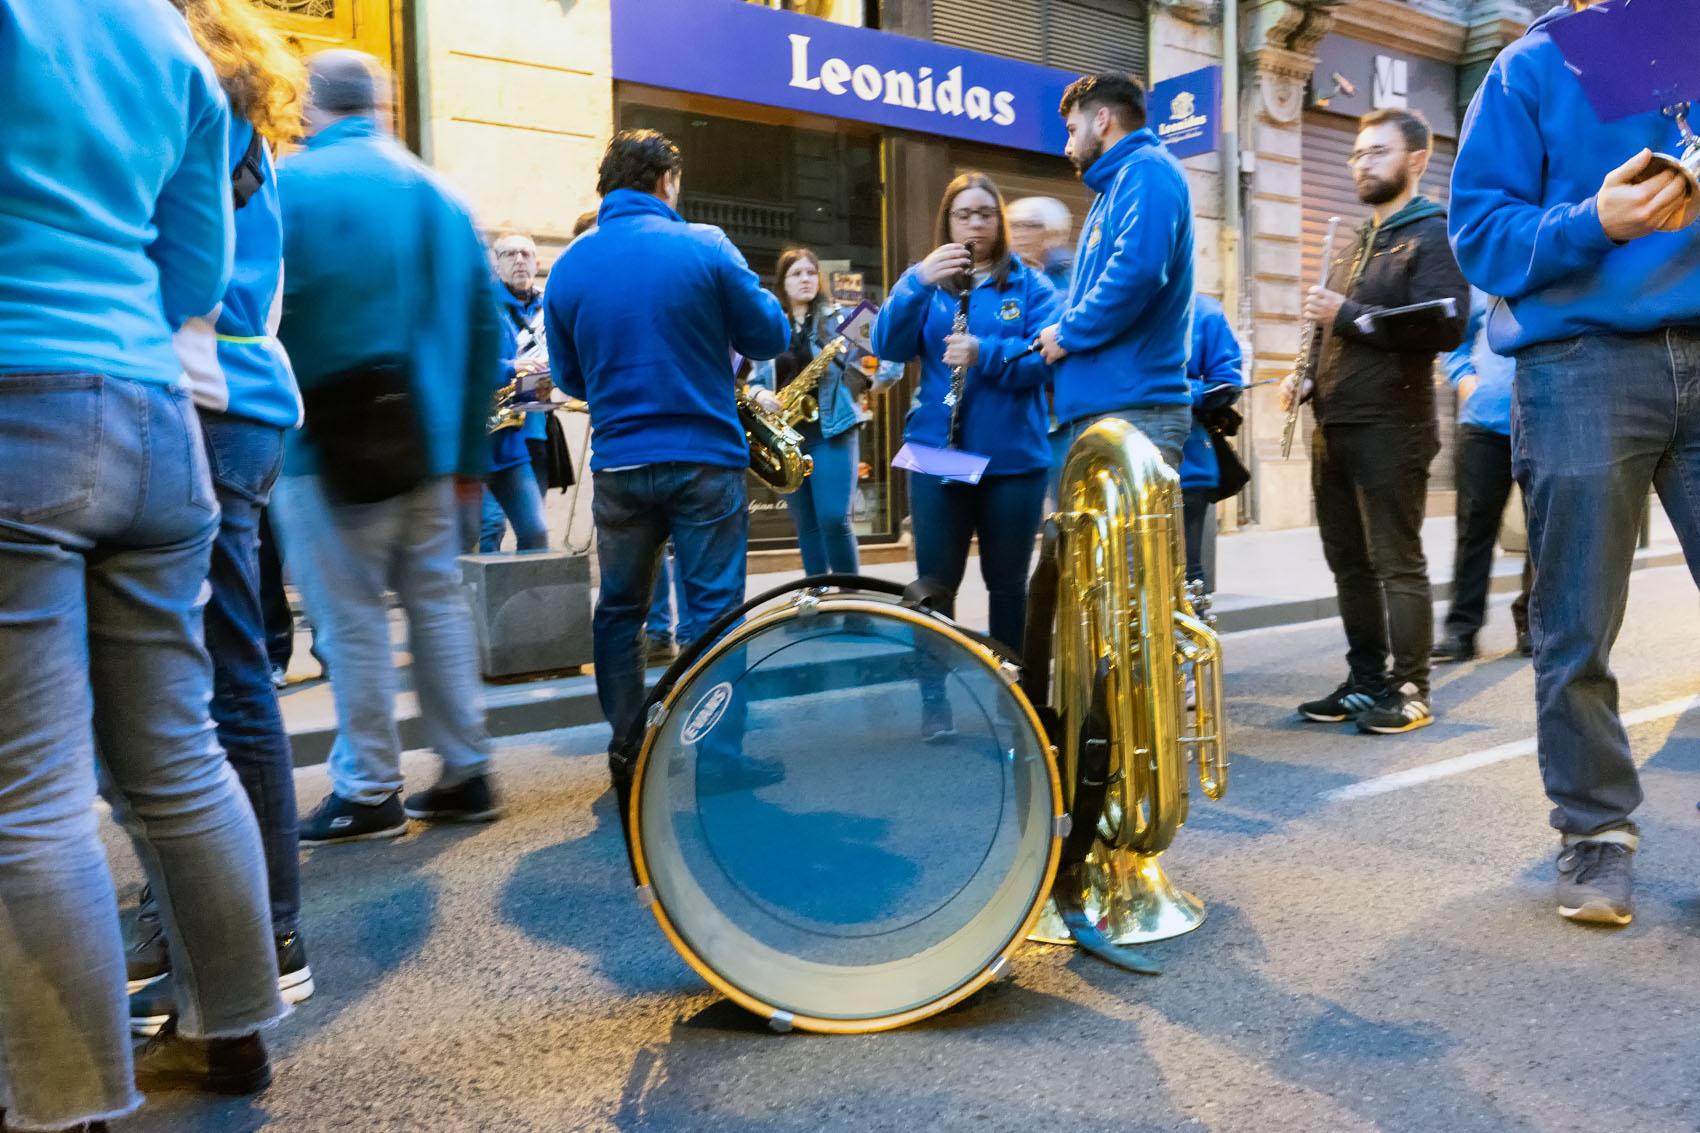 Desperta Marching Band